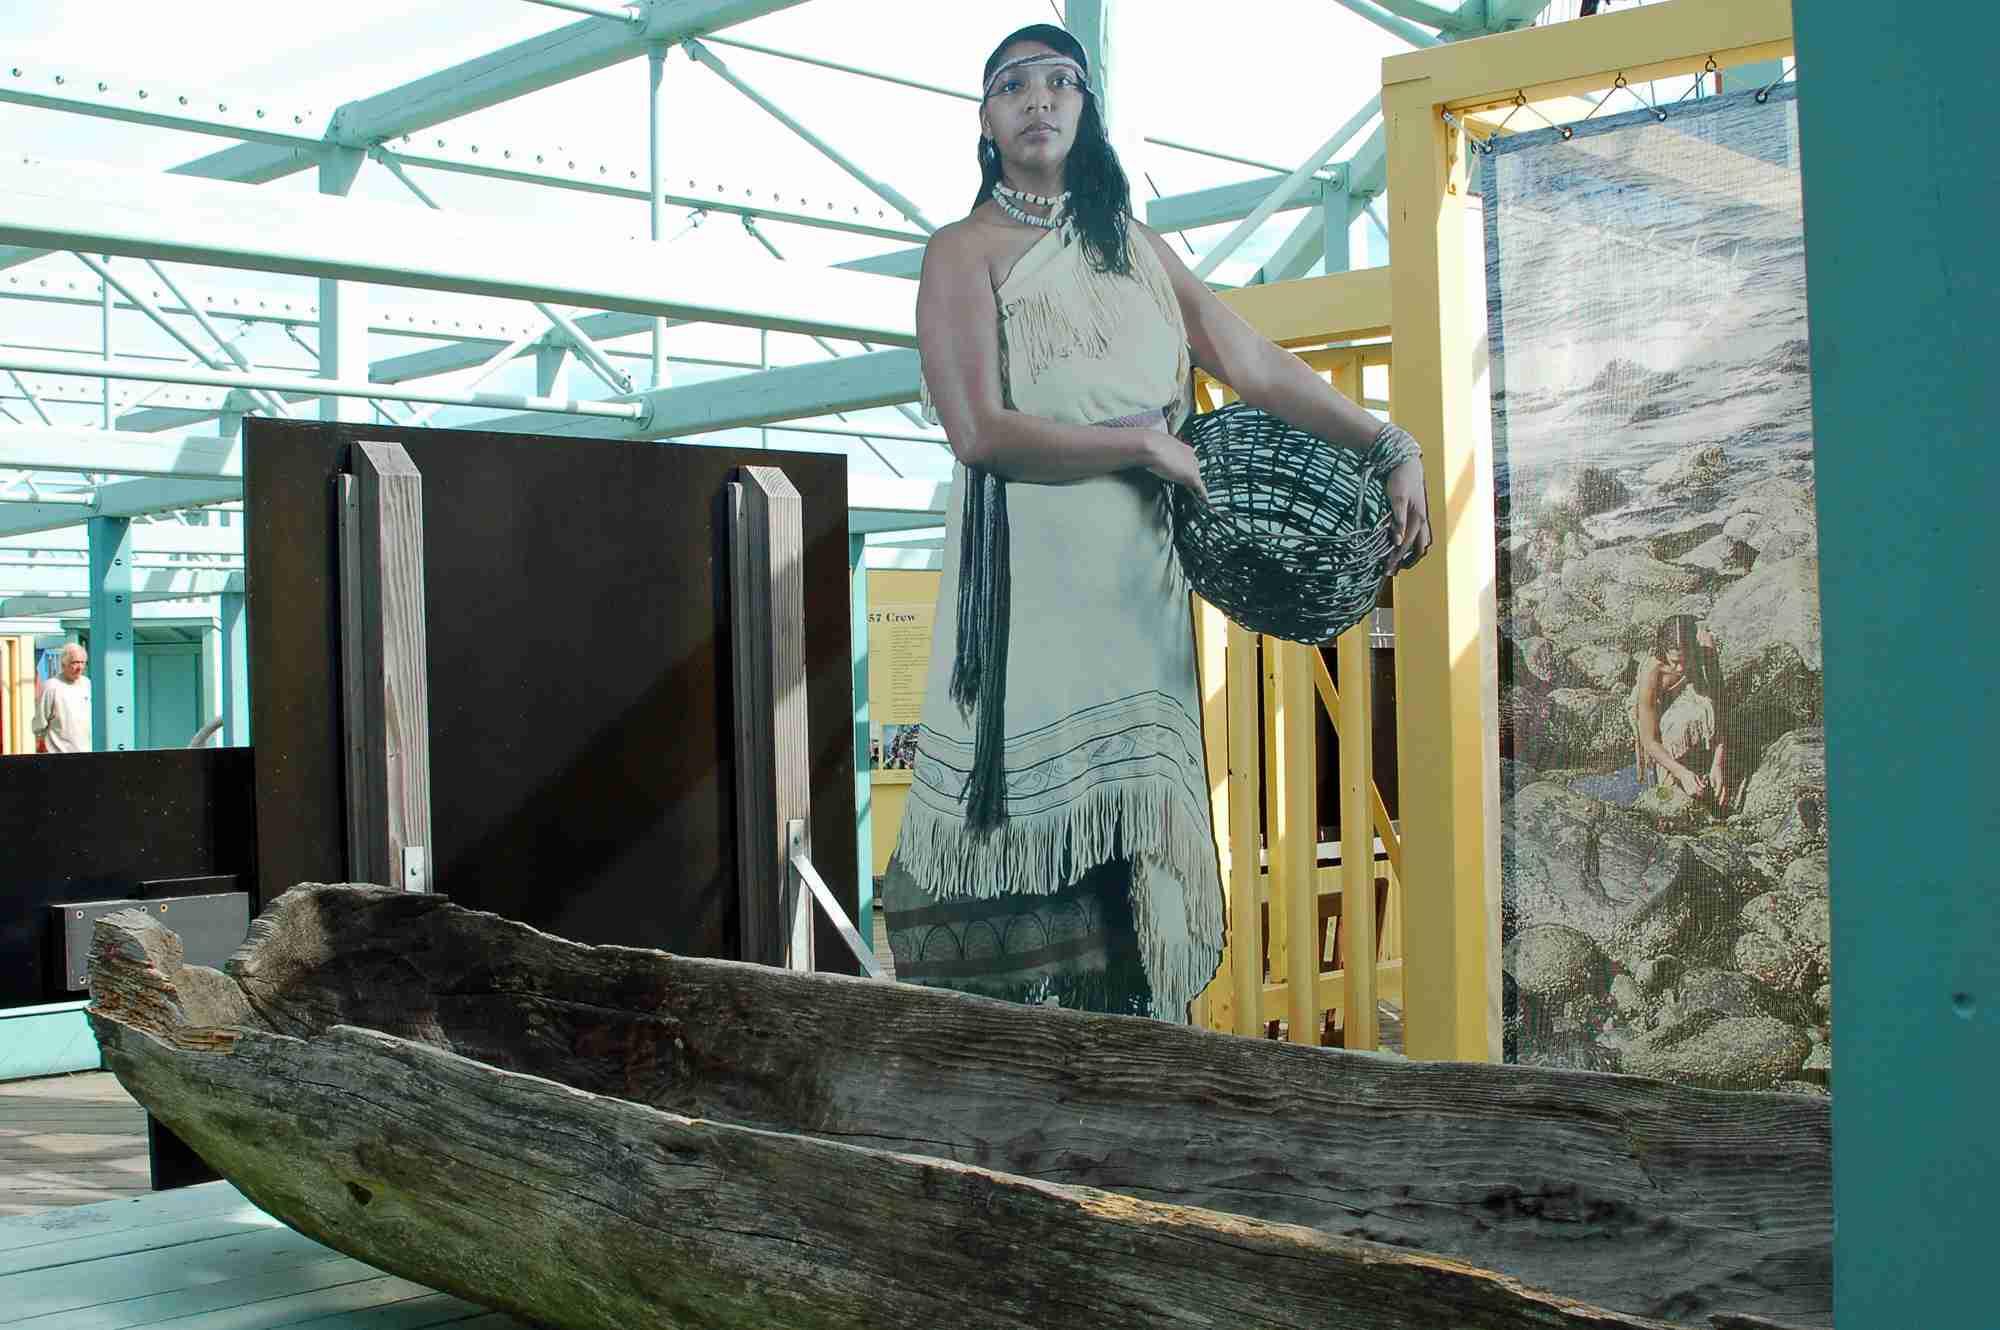 Wampanoag Mashoon Canoe at Mayflower II